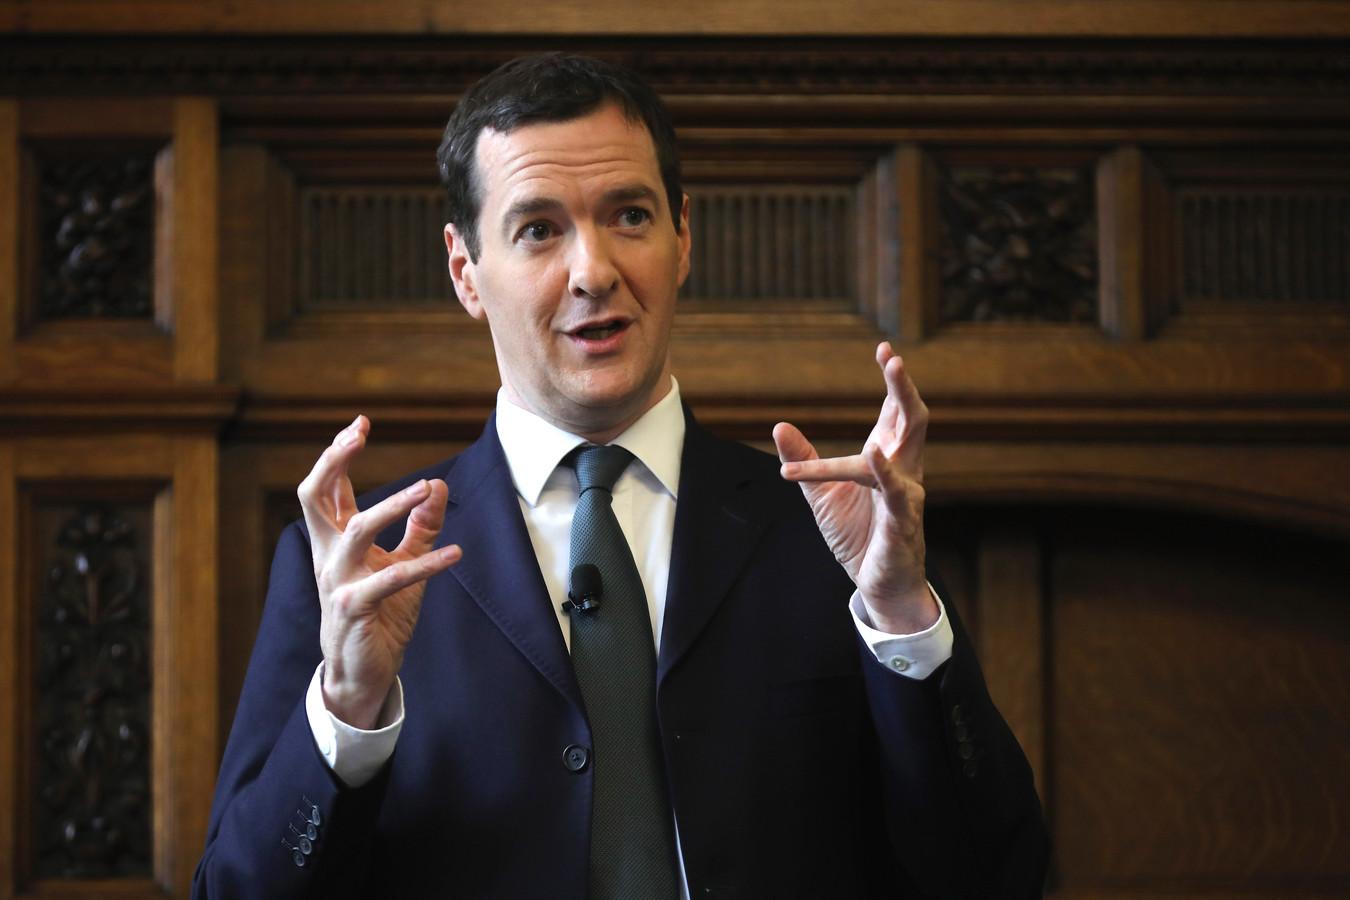 De Britse minister van Financiën George Osborne.